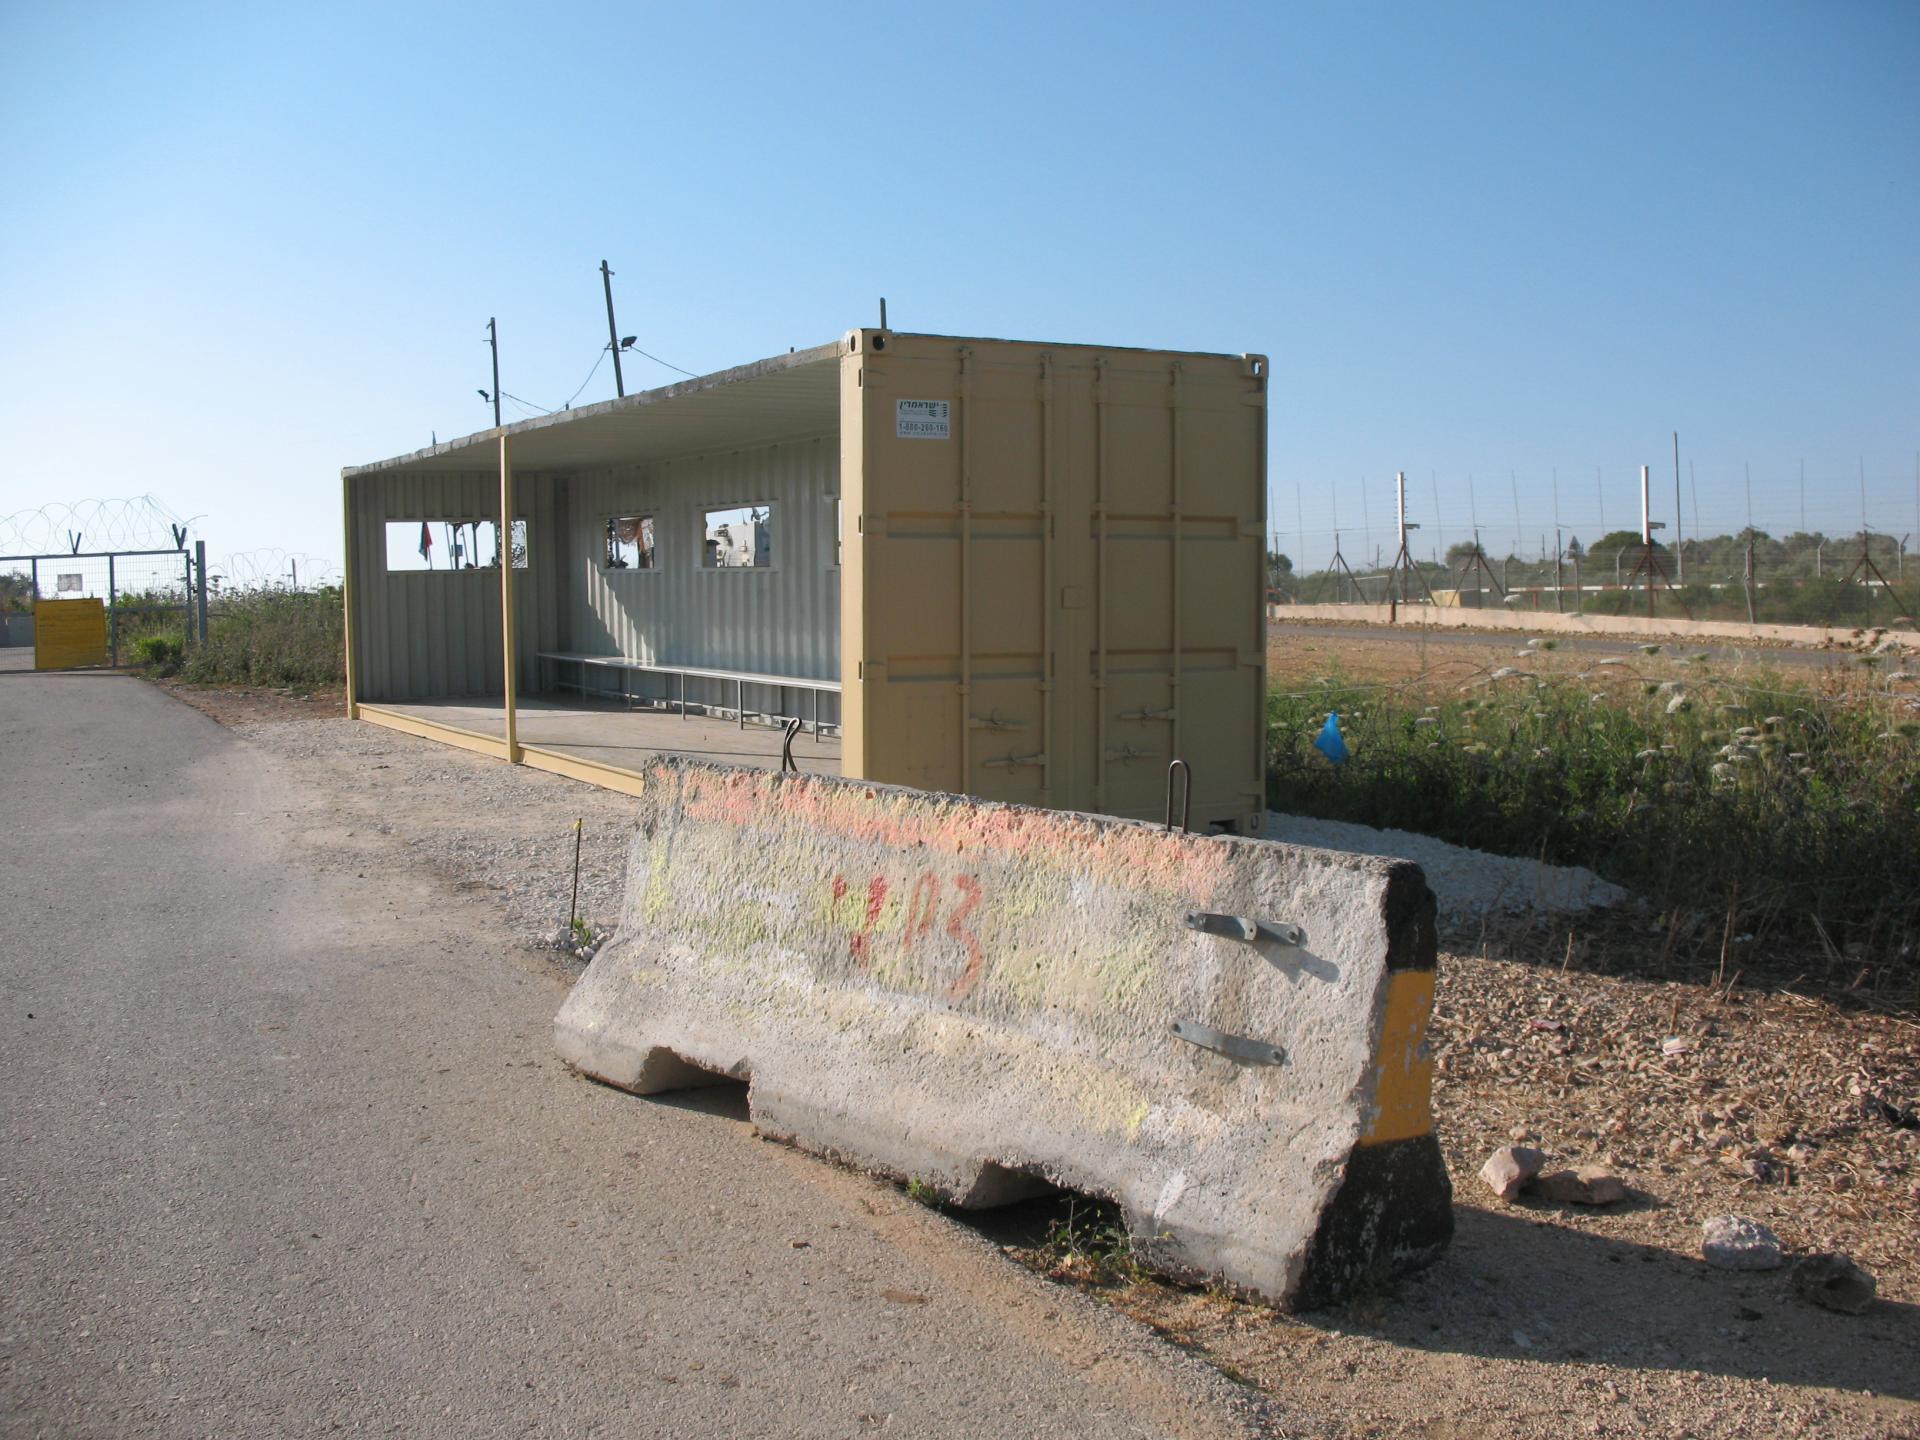 Tura/Shaked checkpoint 01.05.10